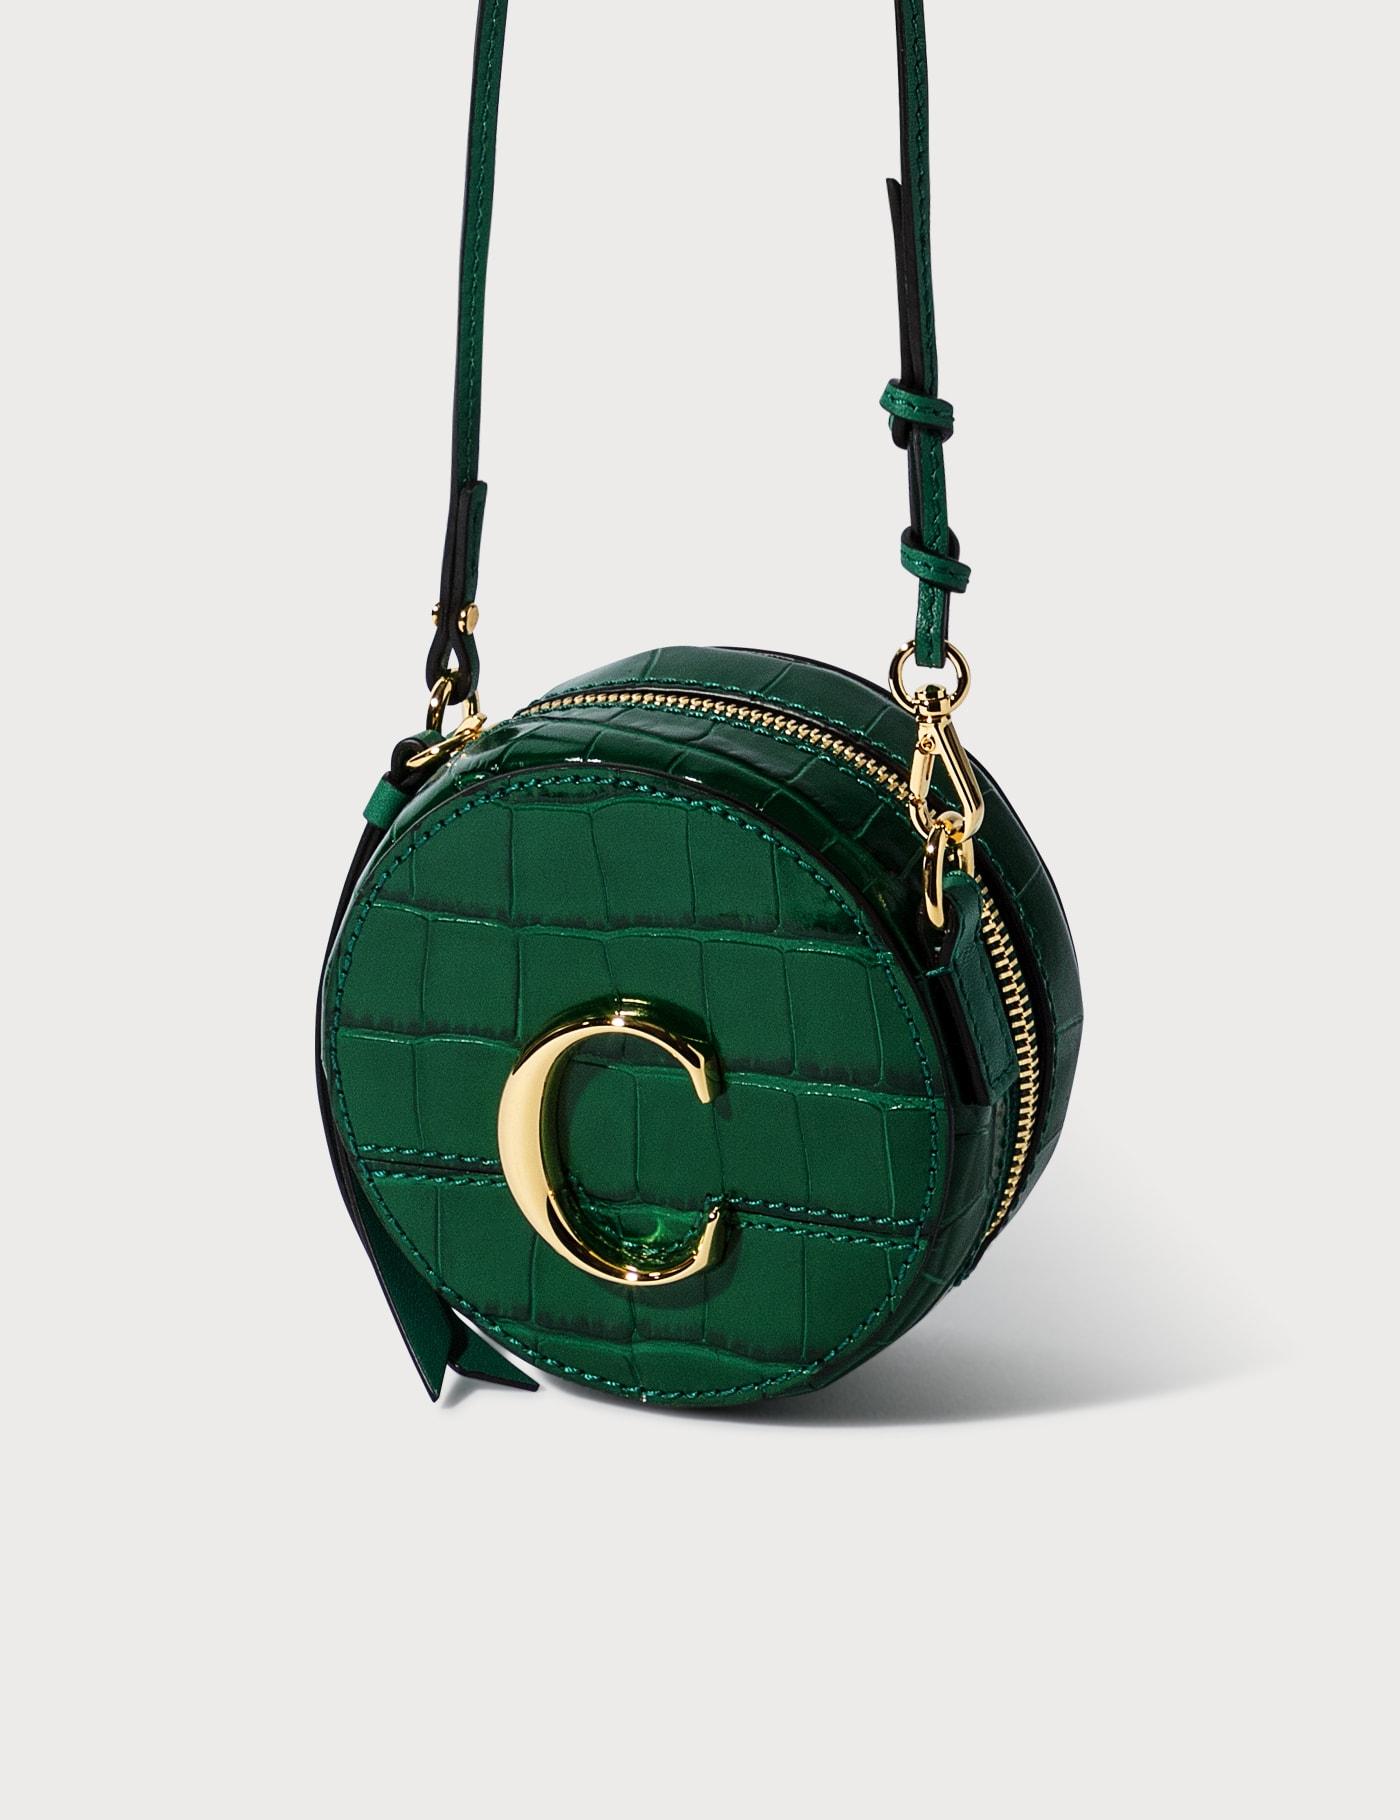 Chlou00e9 C Mini Round Bag